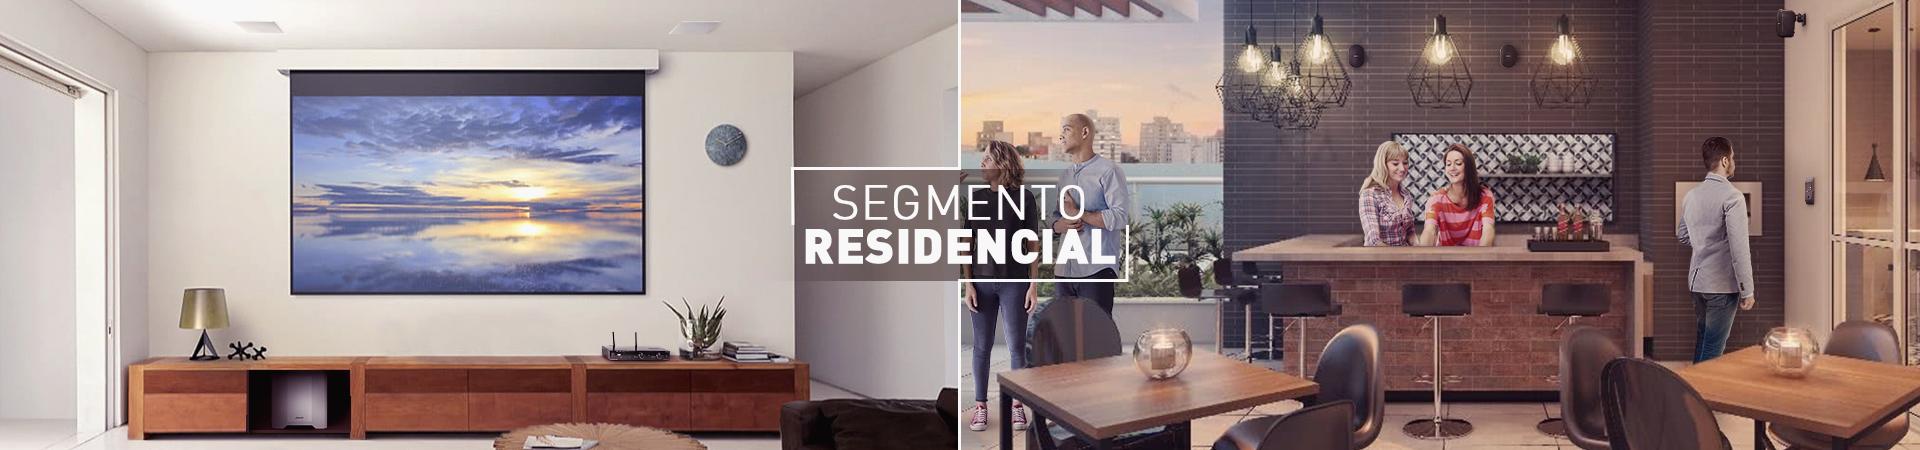 banner_frahm_segmento_residencial_2019_2